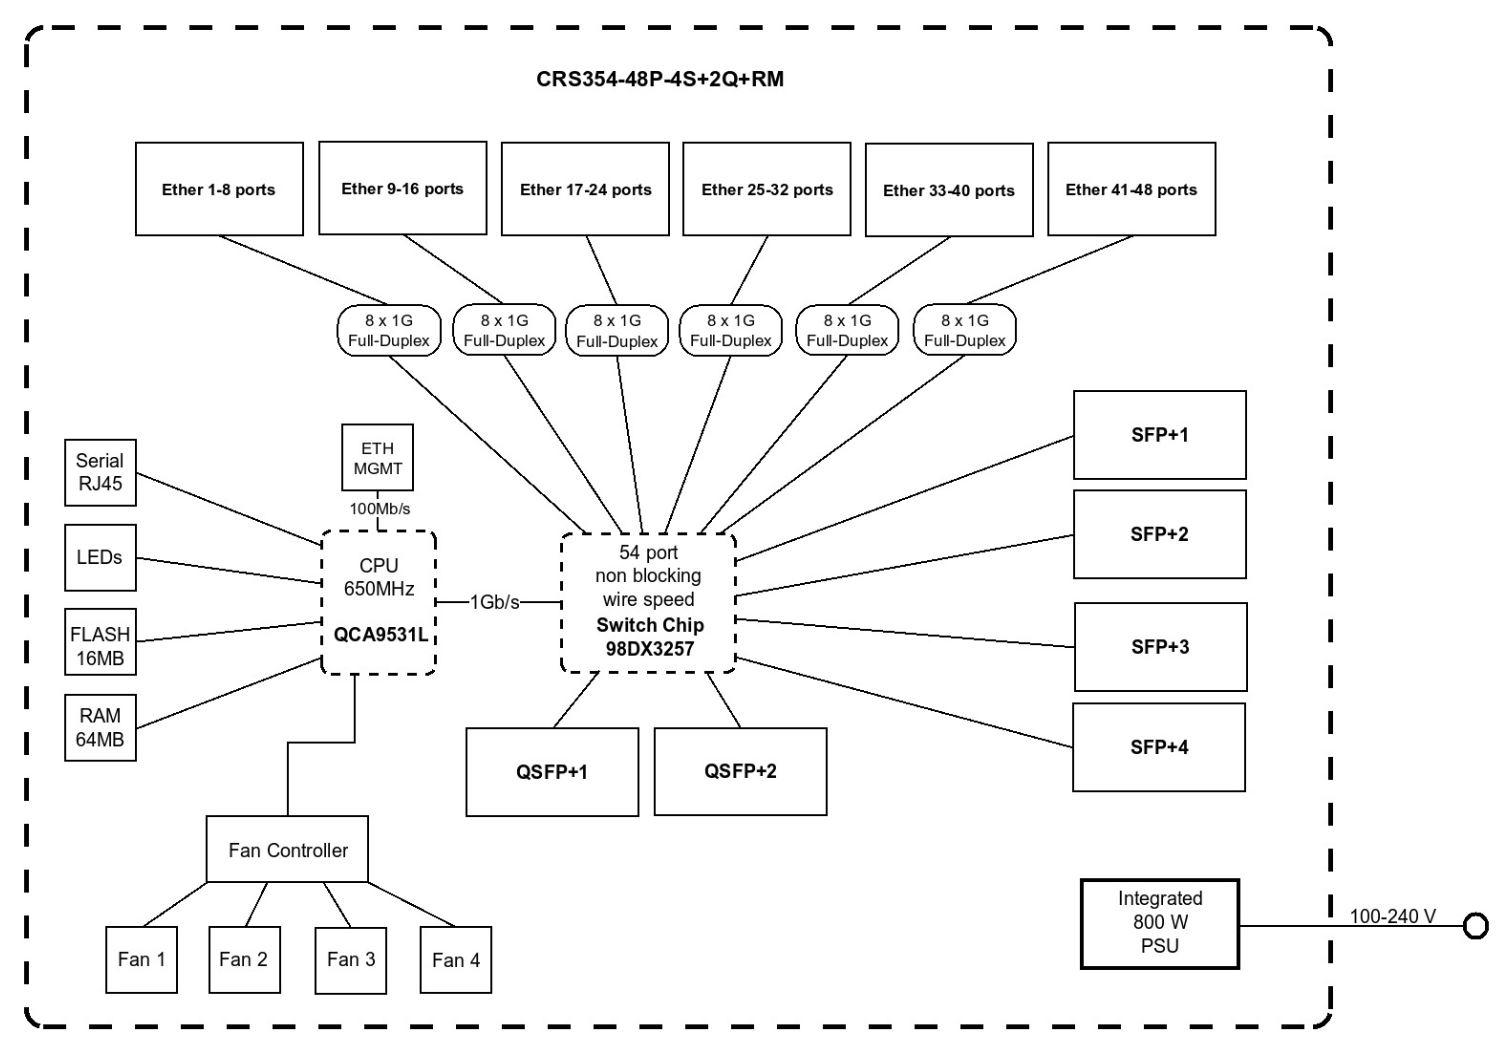 MikroTik CRS354 48G 4S+2Q+RM Block Diagram